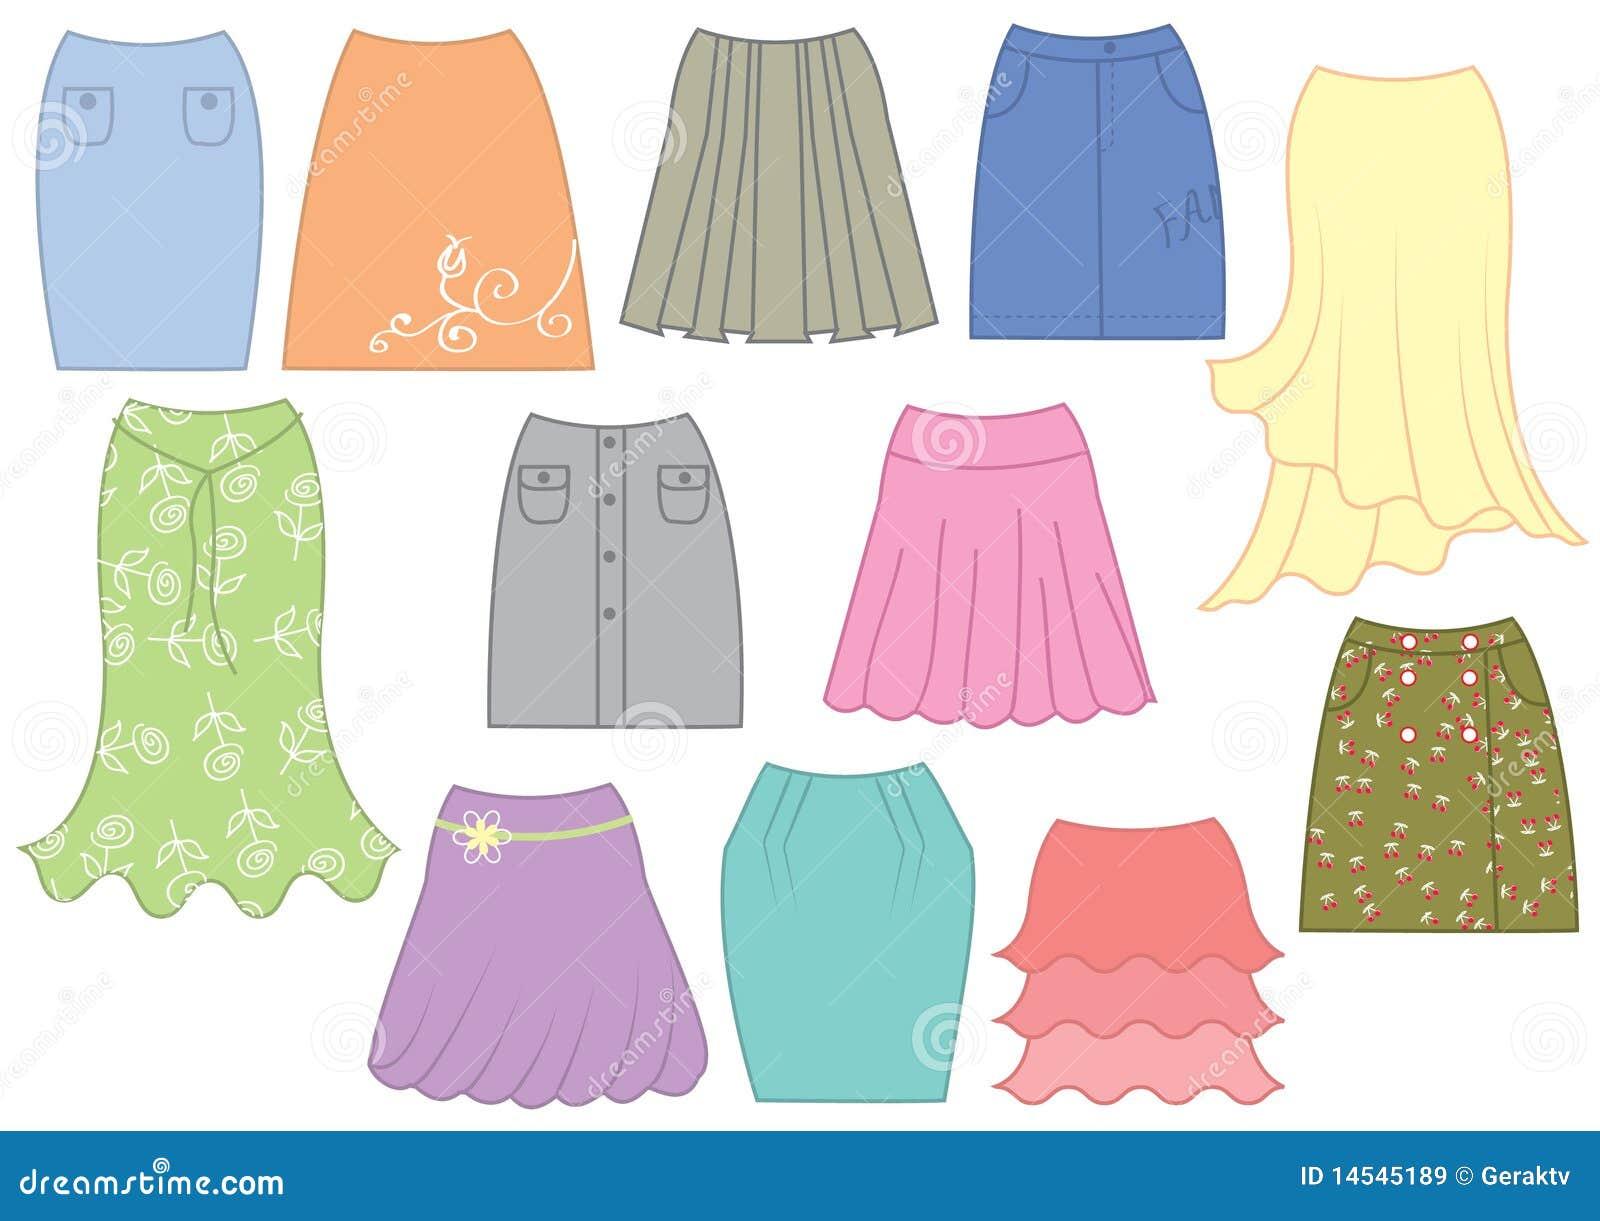 8301ebf817c1bb Dresses and skirts stock vector. Illustration of fashion - 14545189